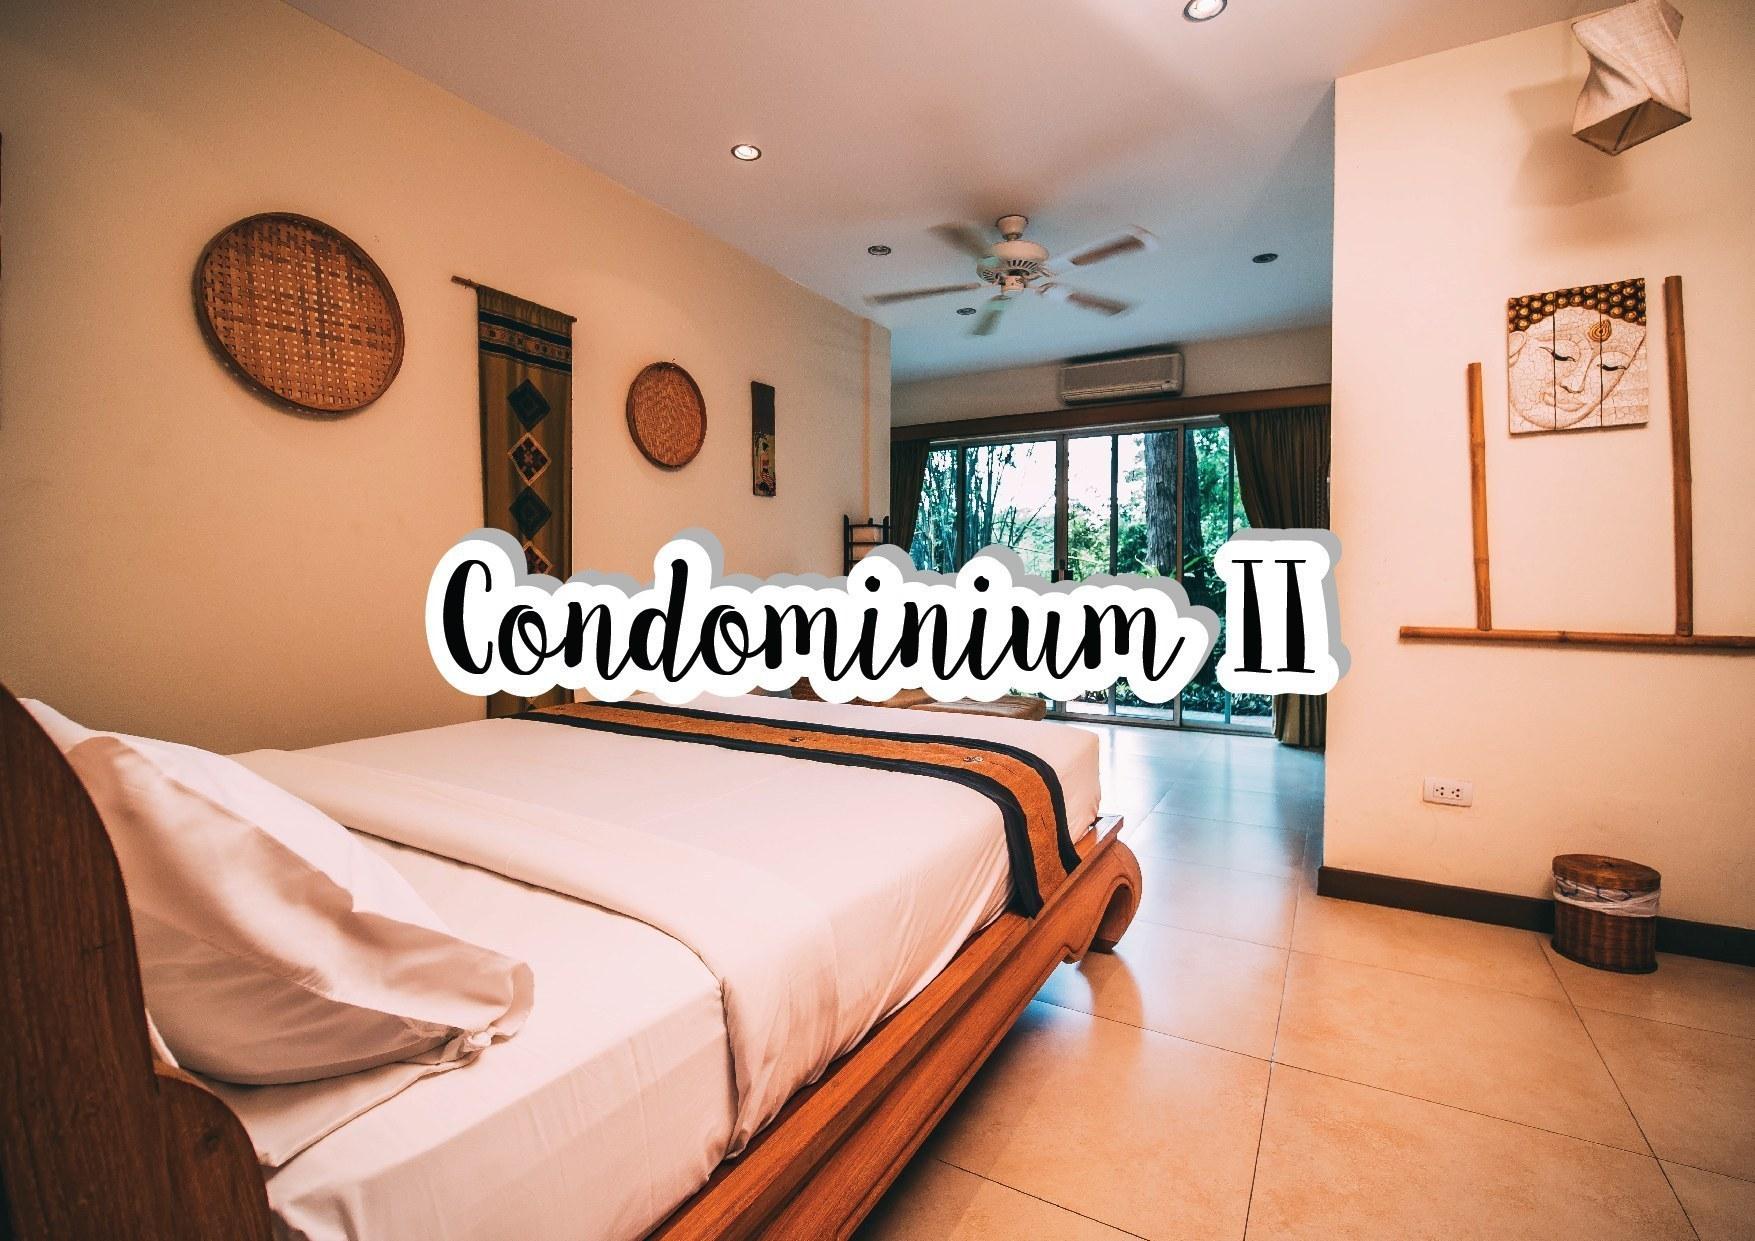 Tao Garden Condominium II